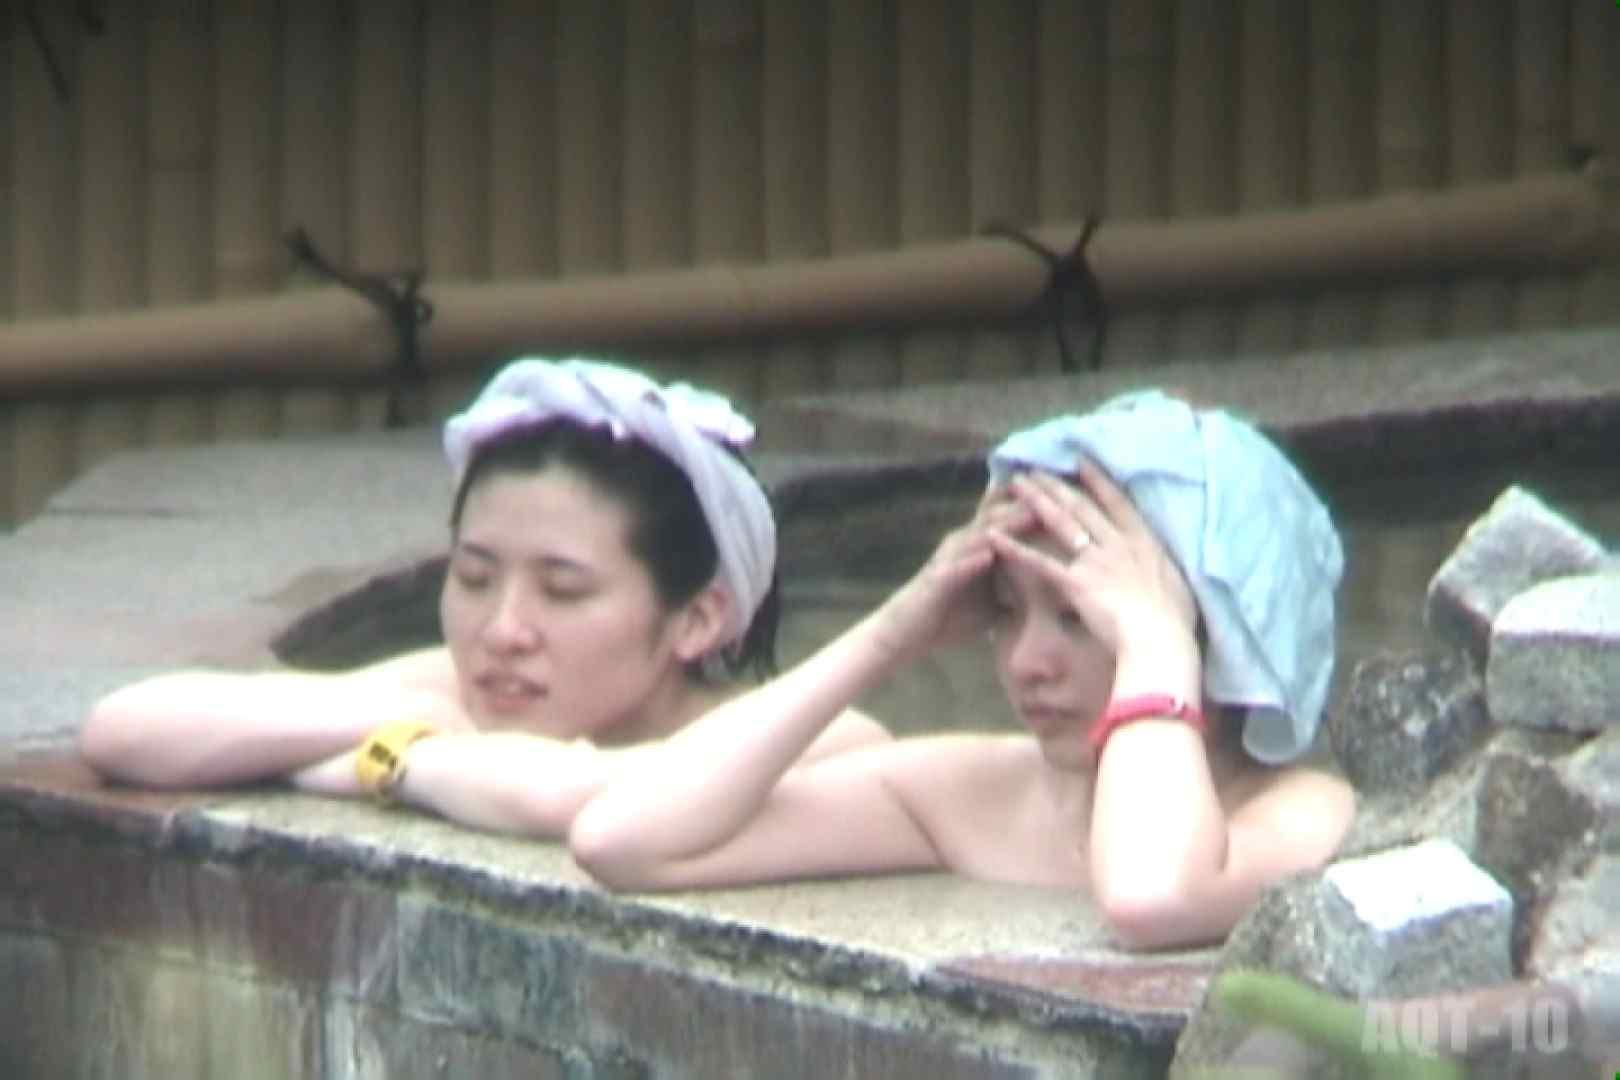 Aquaな露天風呂Vol.793 盗撮シリーズ   露天風呂編  93PIX 49